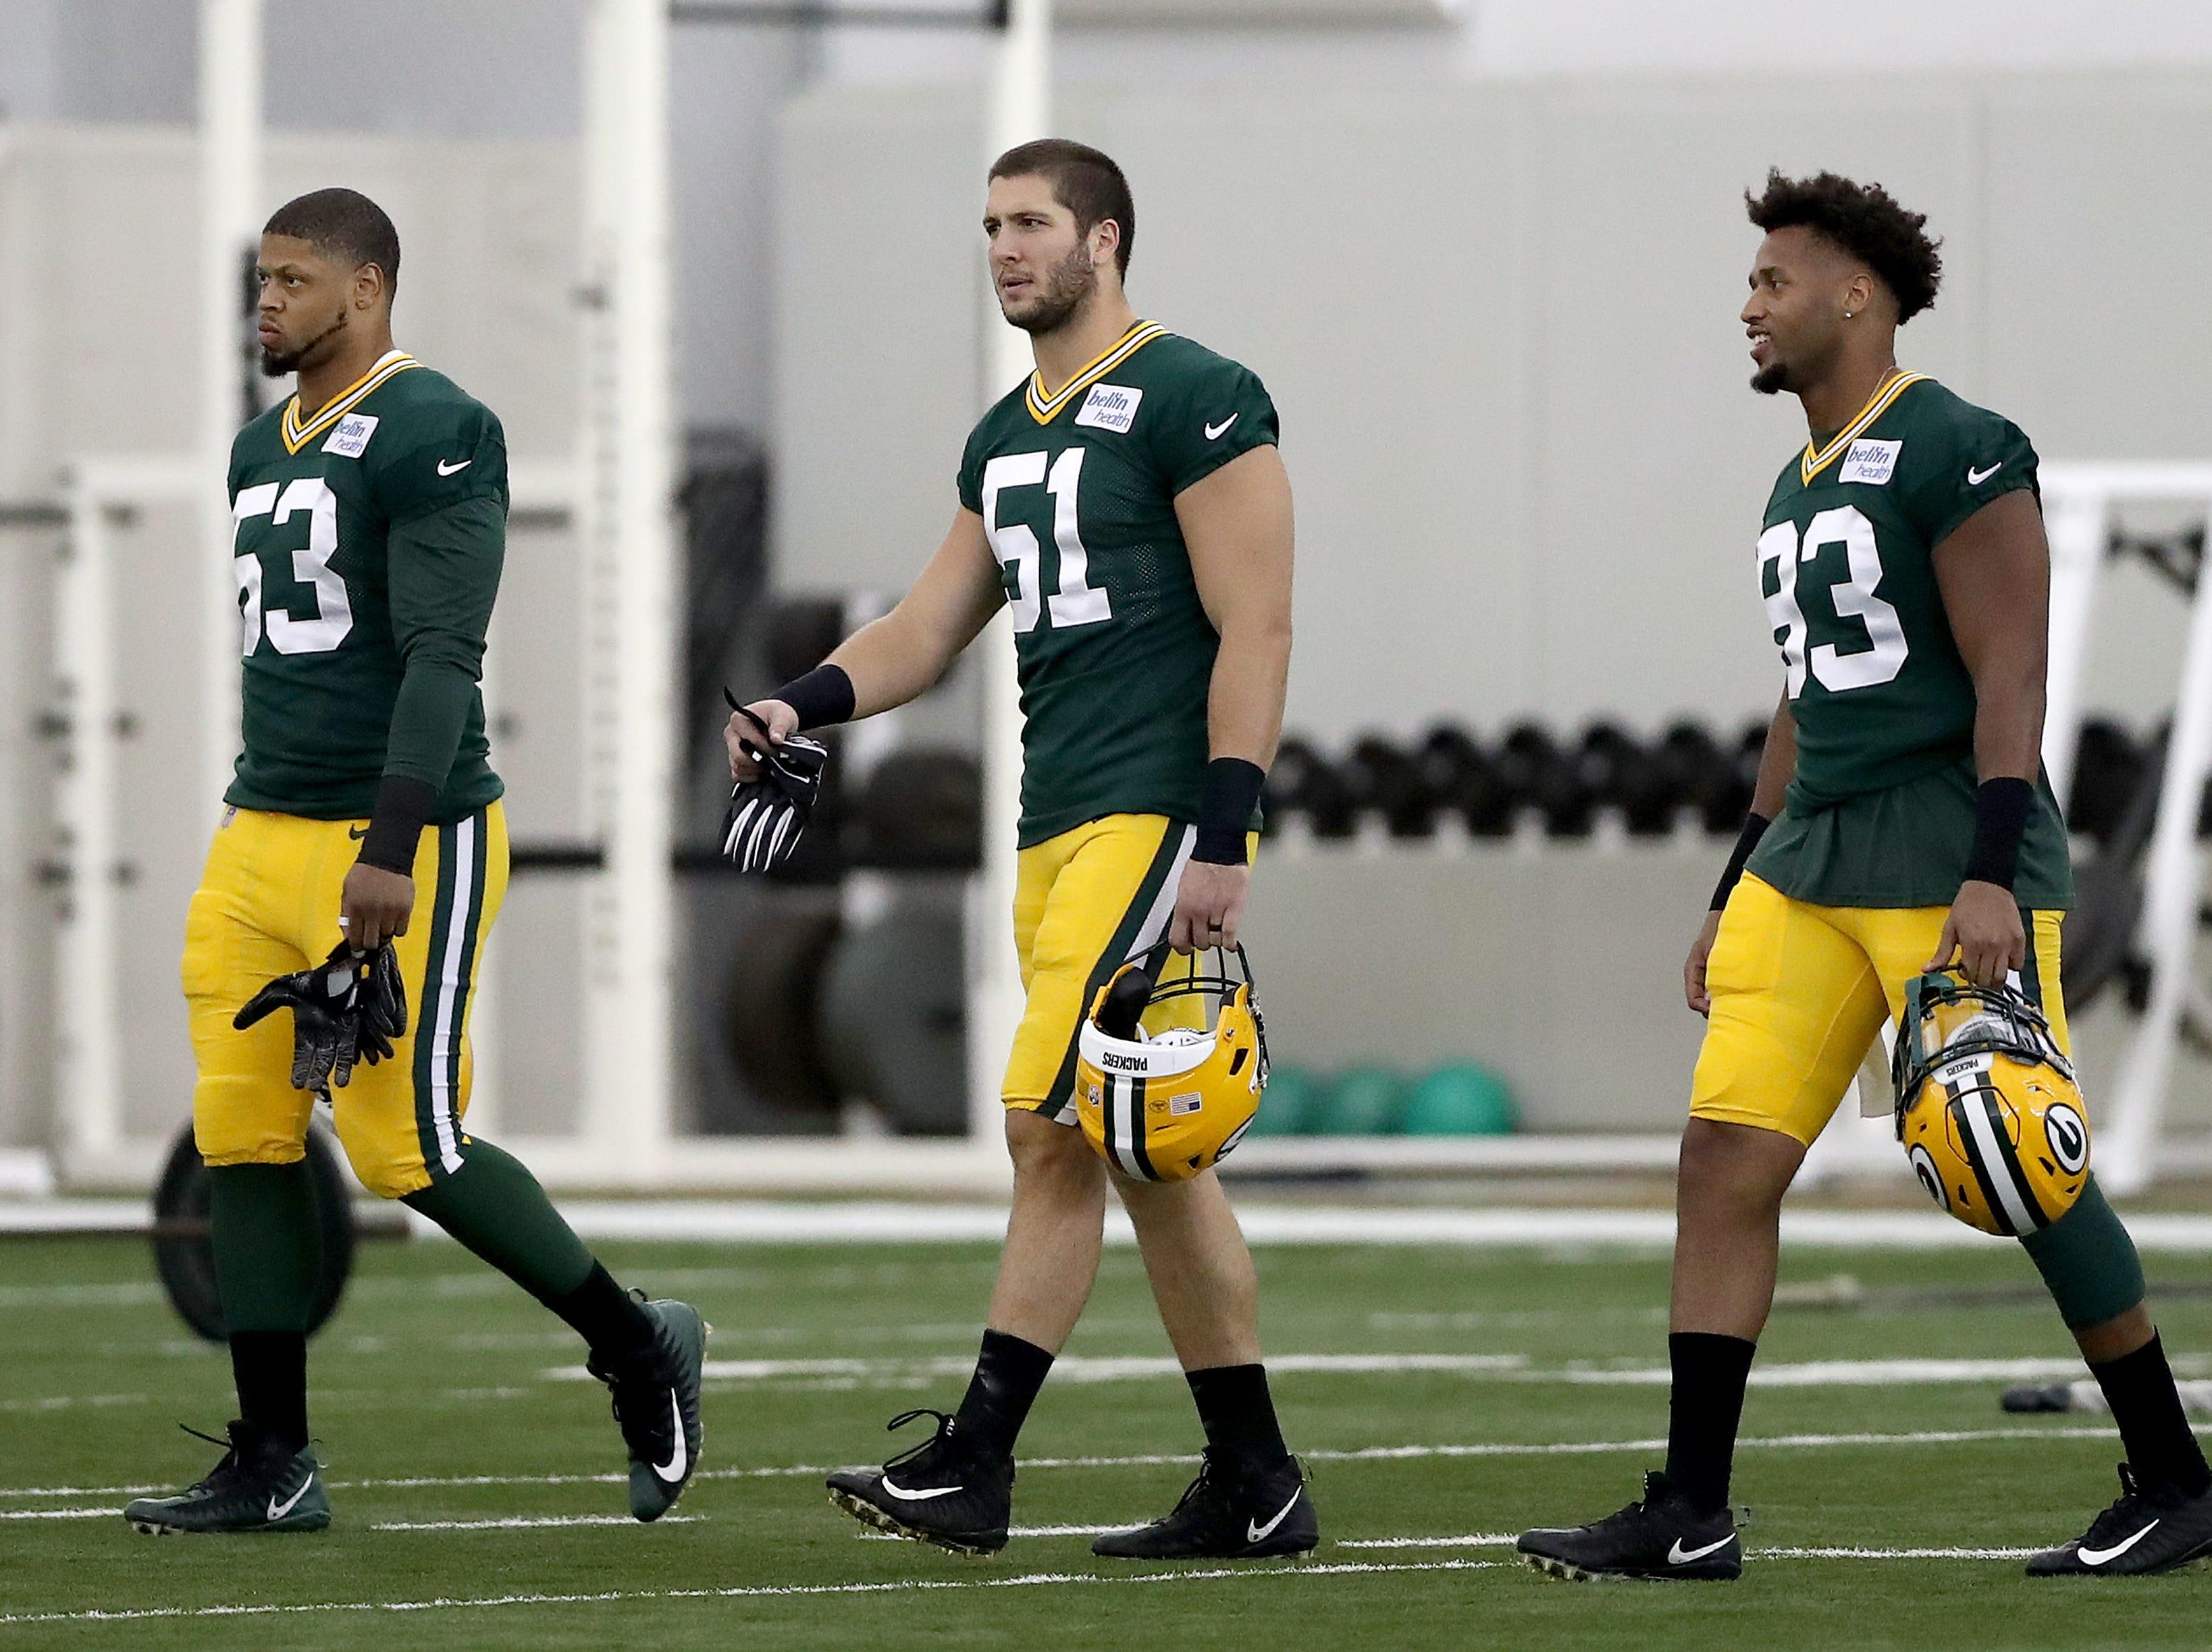 Green Bay Packers linebacker Nick Perry (53), linebacker Kyler Fackrell (51) and linebacker Reggie Gilbert during Packers practice in the Don Hutson Center Monday, September 3, 2018 in Ashwaubenon, Wis